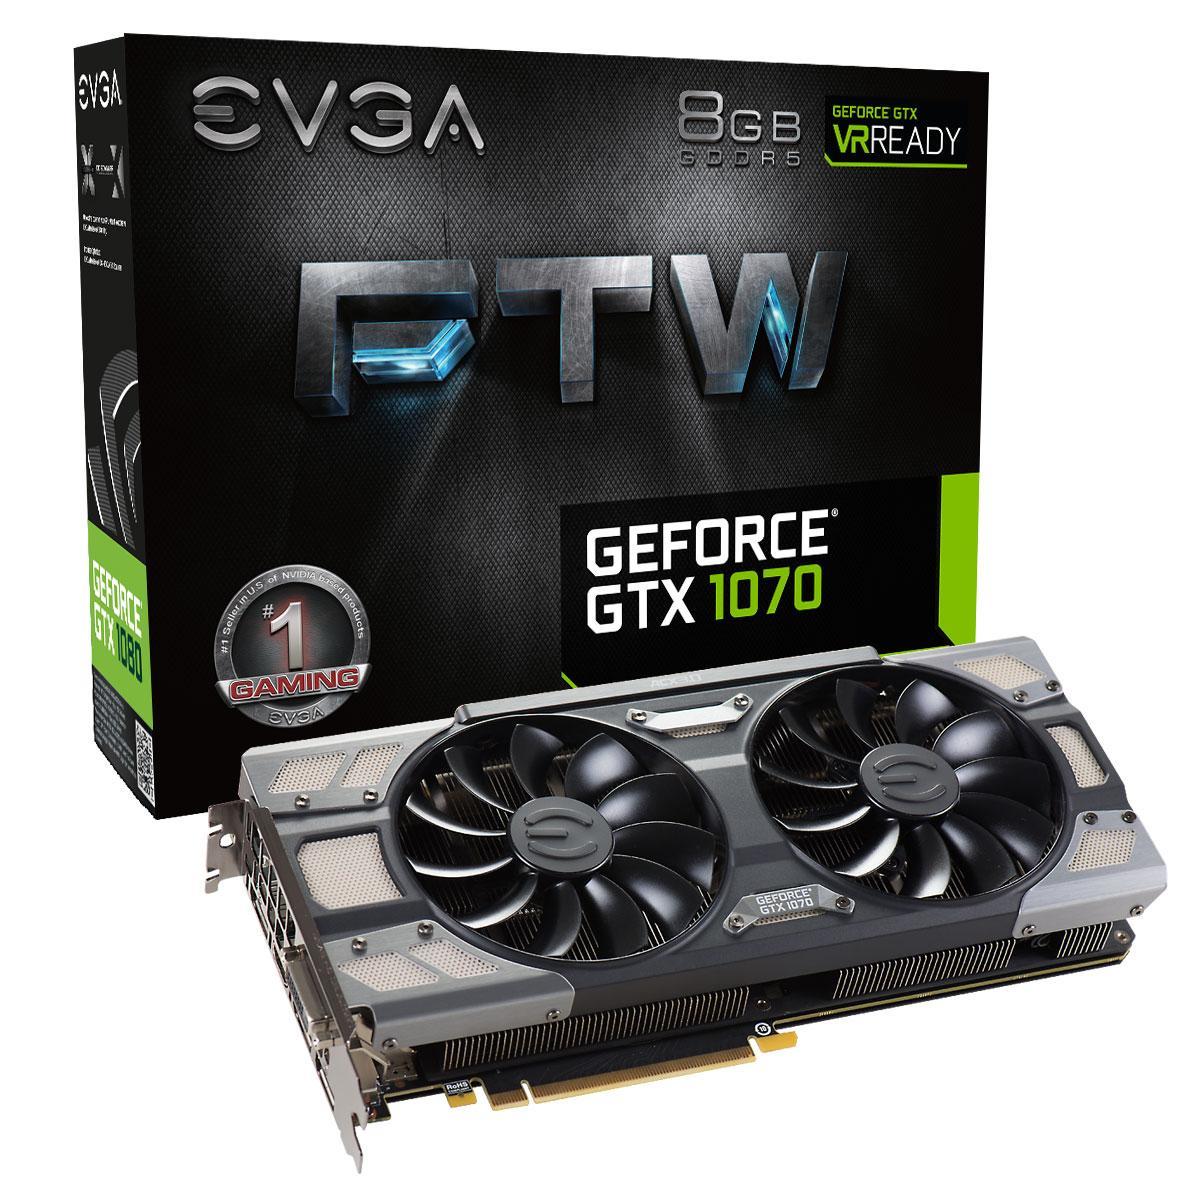 Carte Graphique GeForce GTX 1070 FTW Gaming ACX 3.0 - 8 Go + Gears of War 4 offert